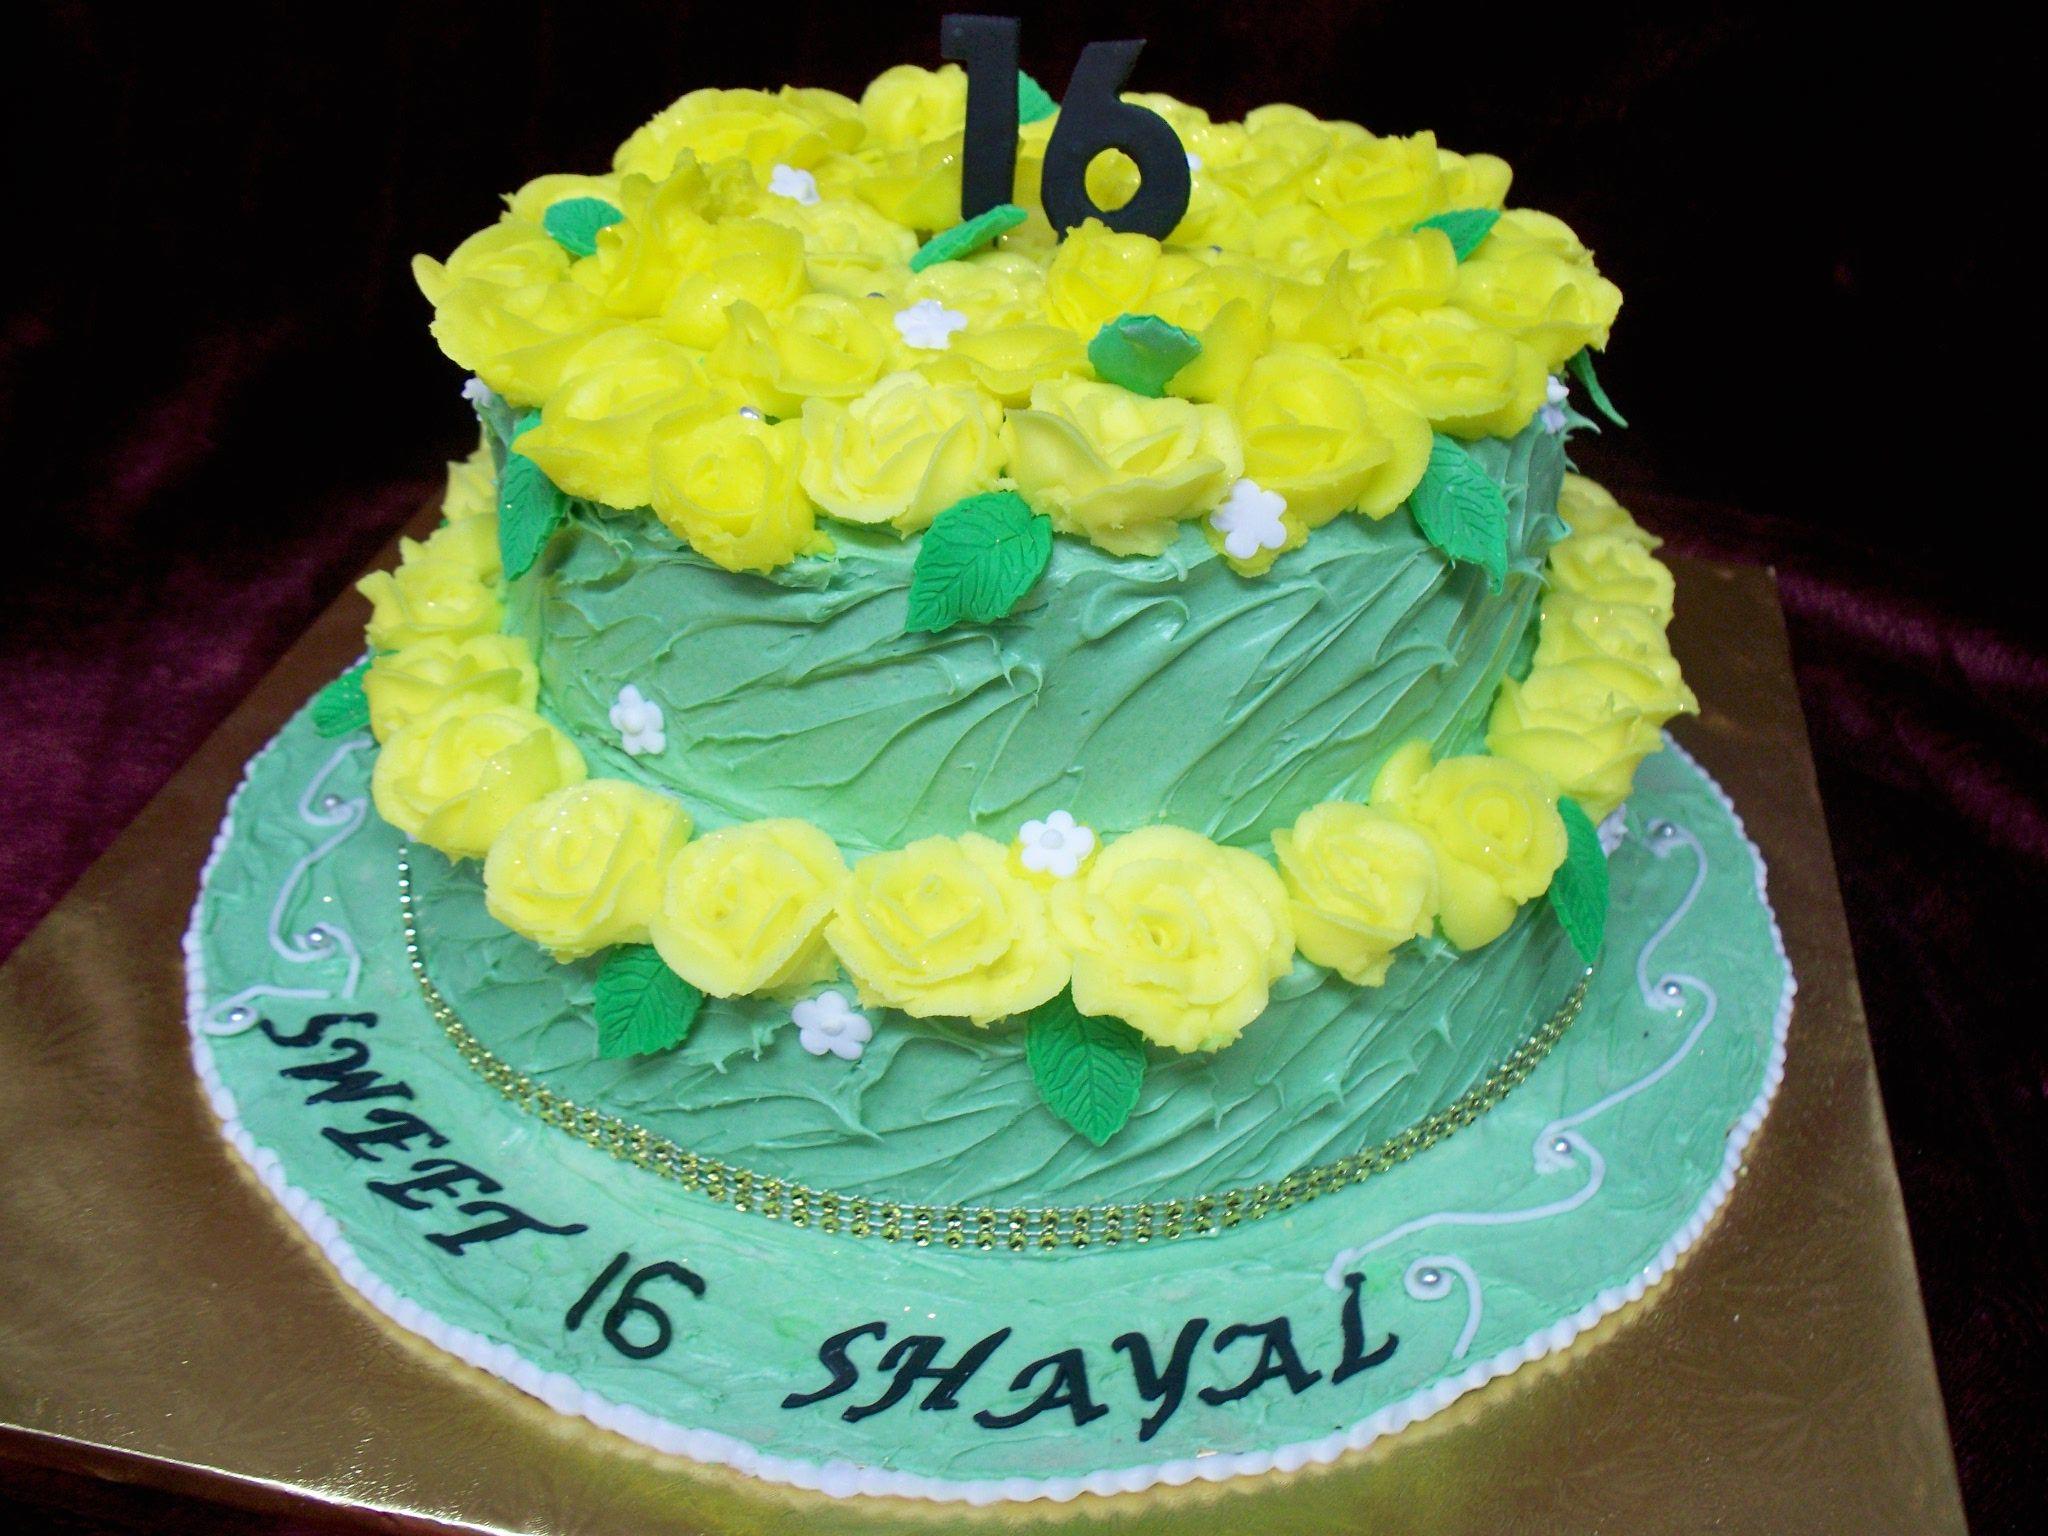 Sweet 16 birthday cake Best Birthday Cakes in Auckland New Zealand